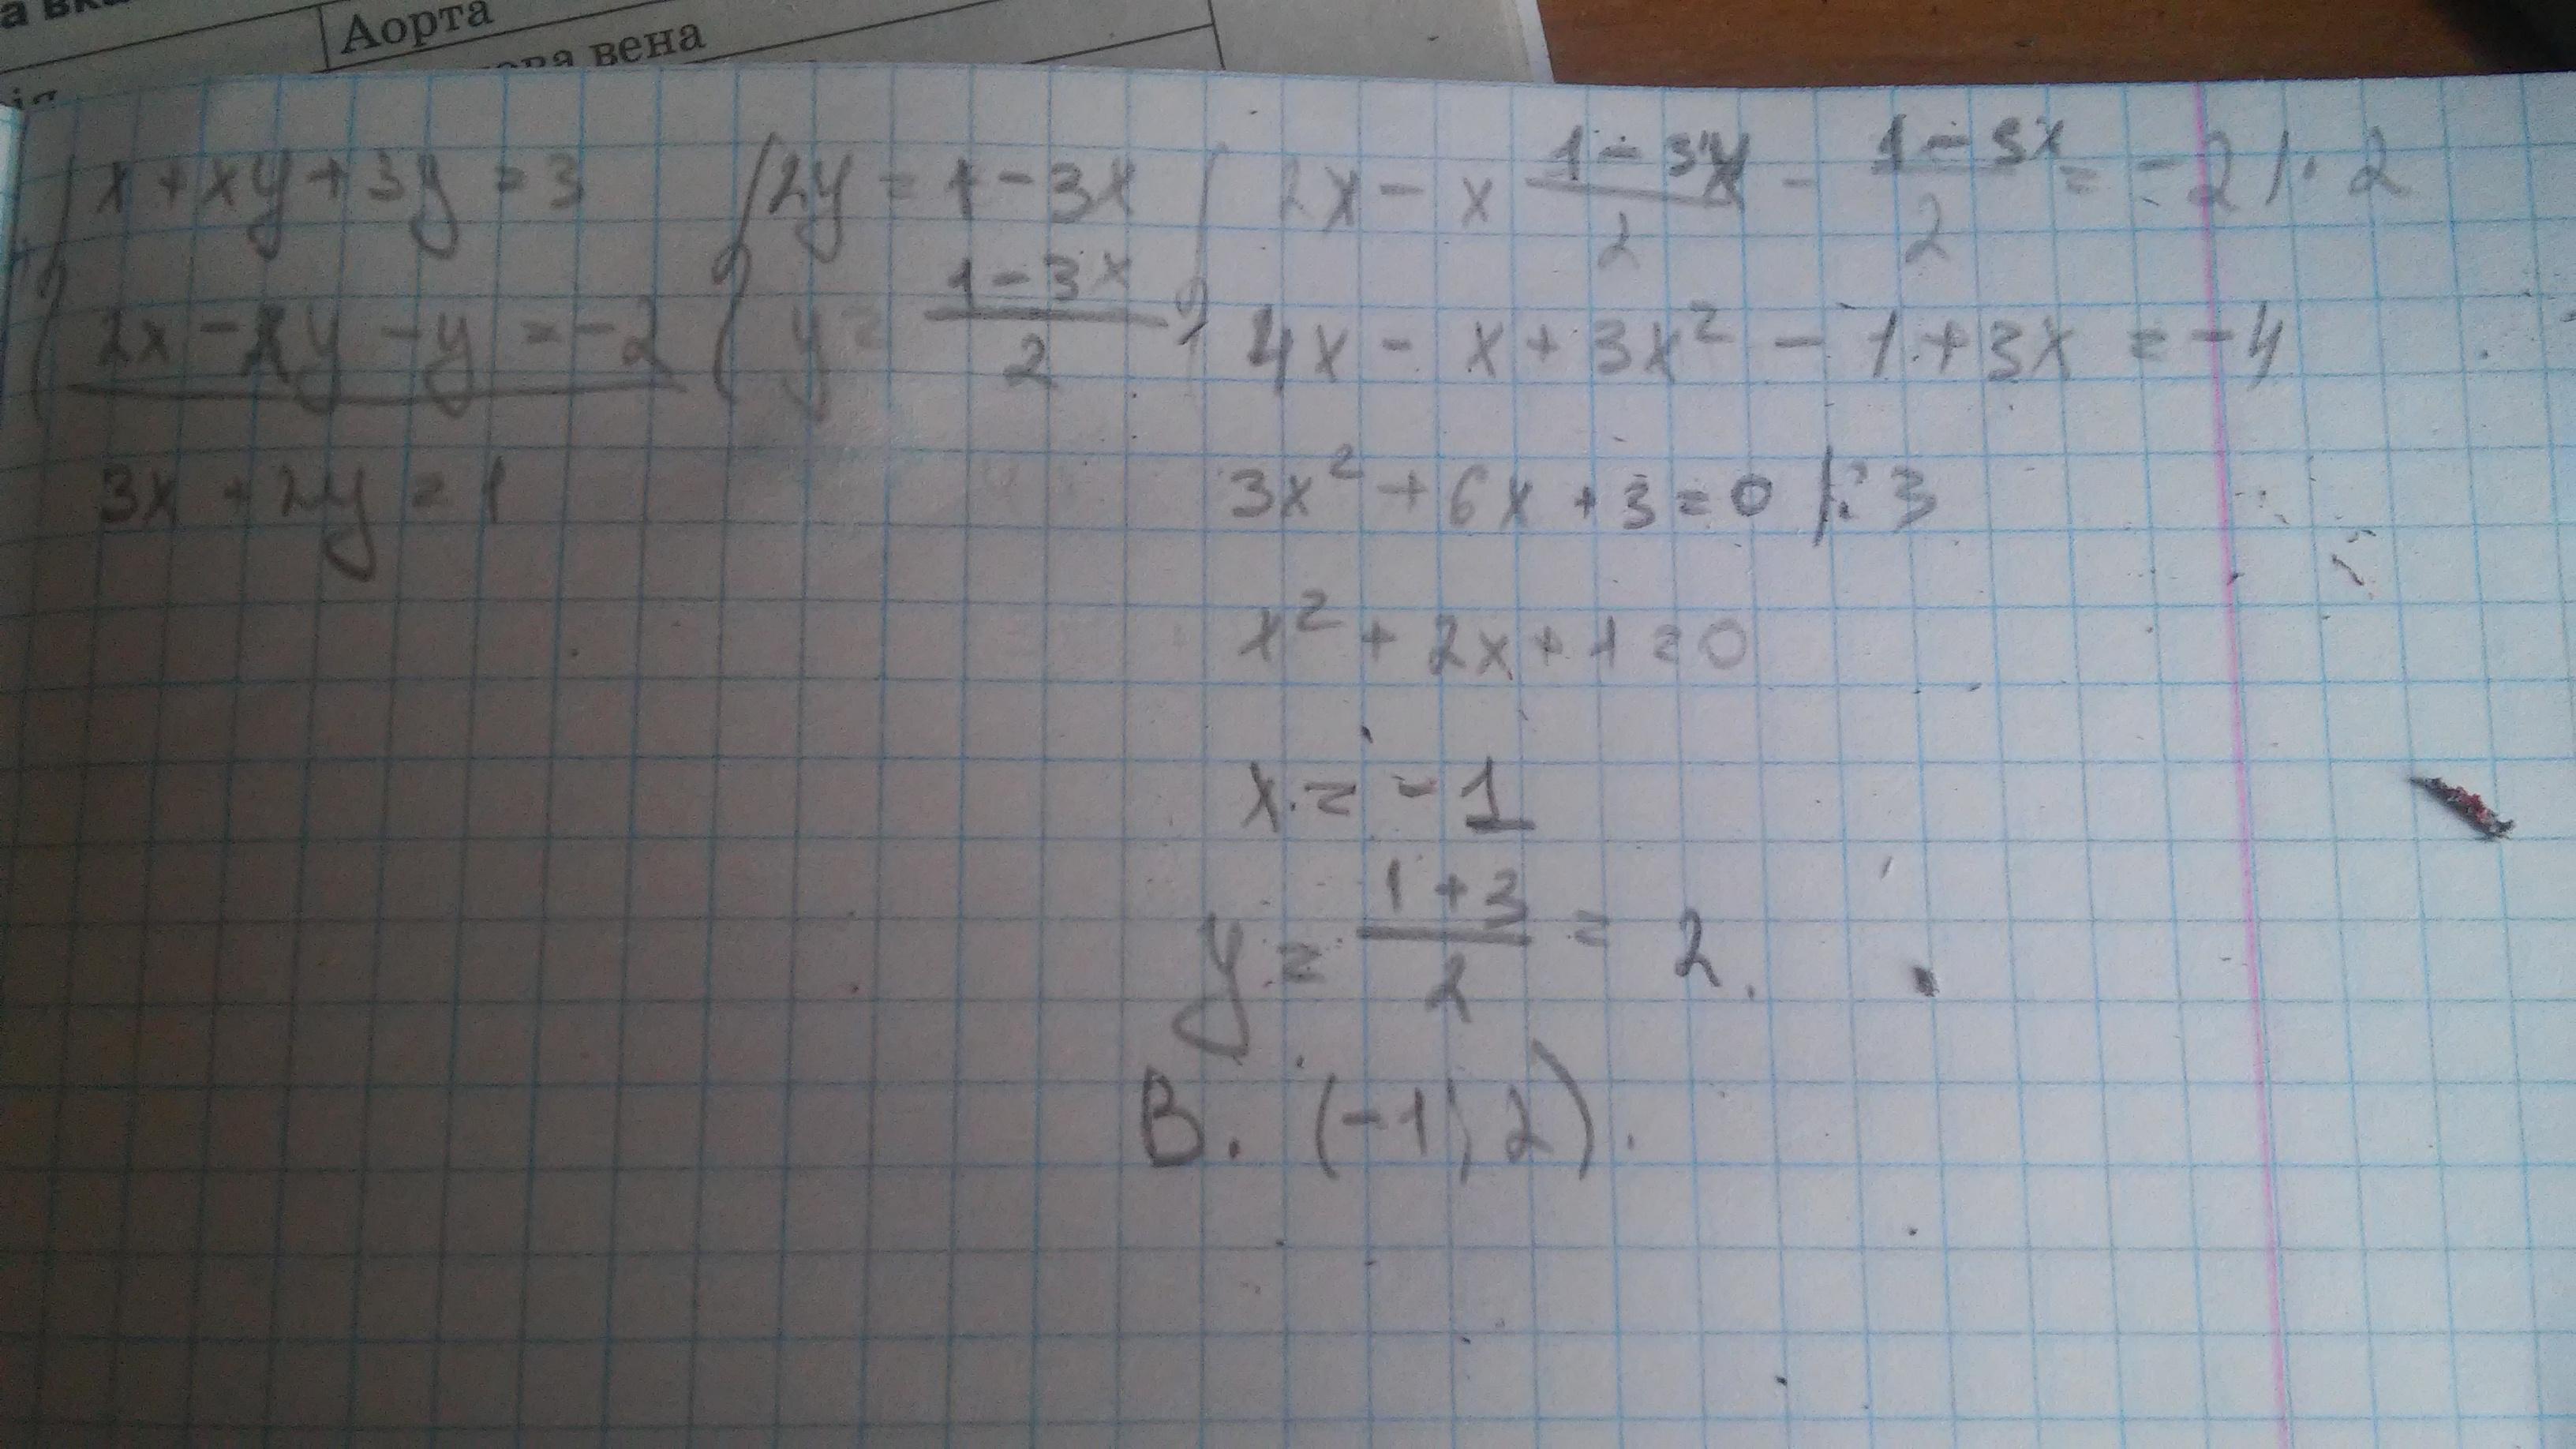 Х+ху+3у=3 2х-ху-у=-2 помогите пожалуйста, только